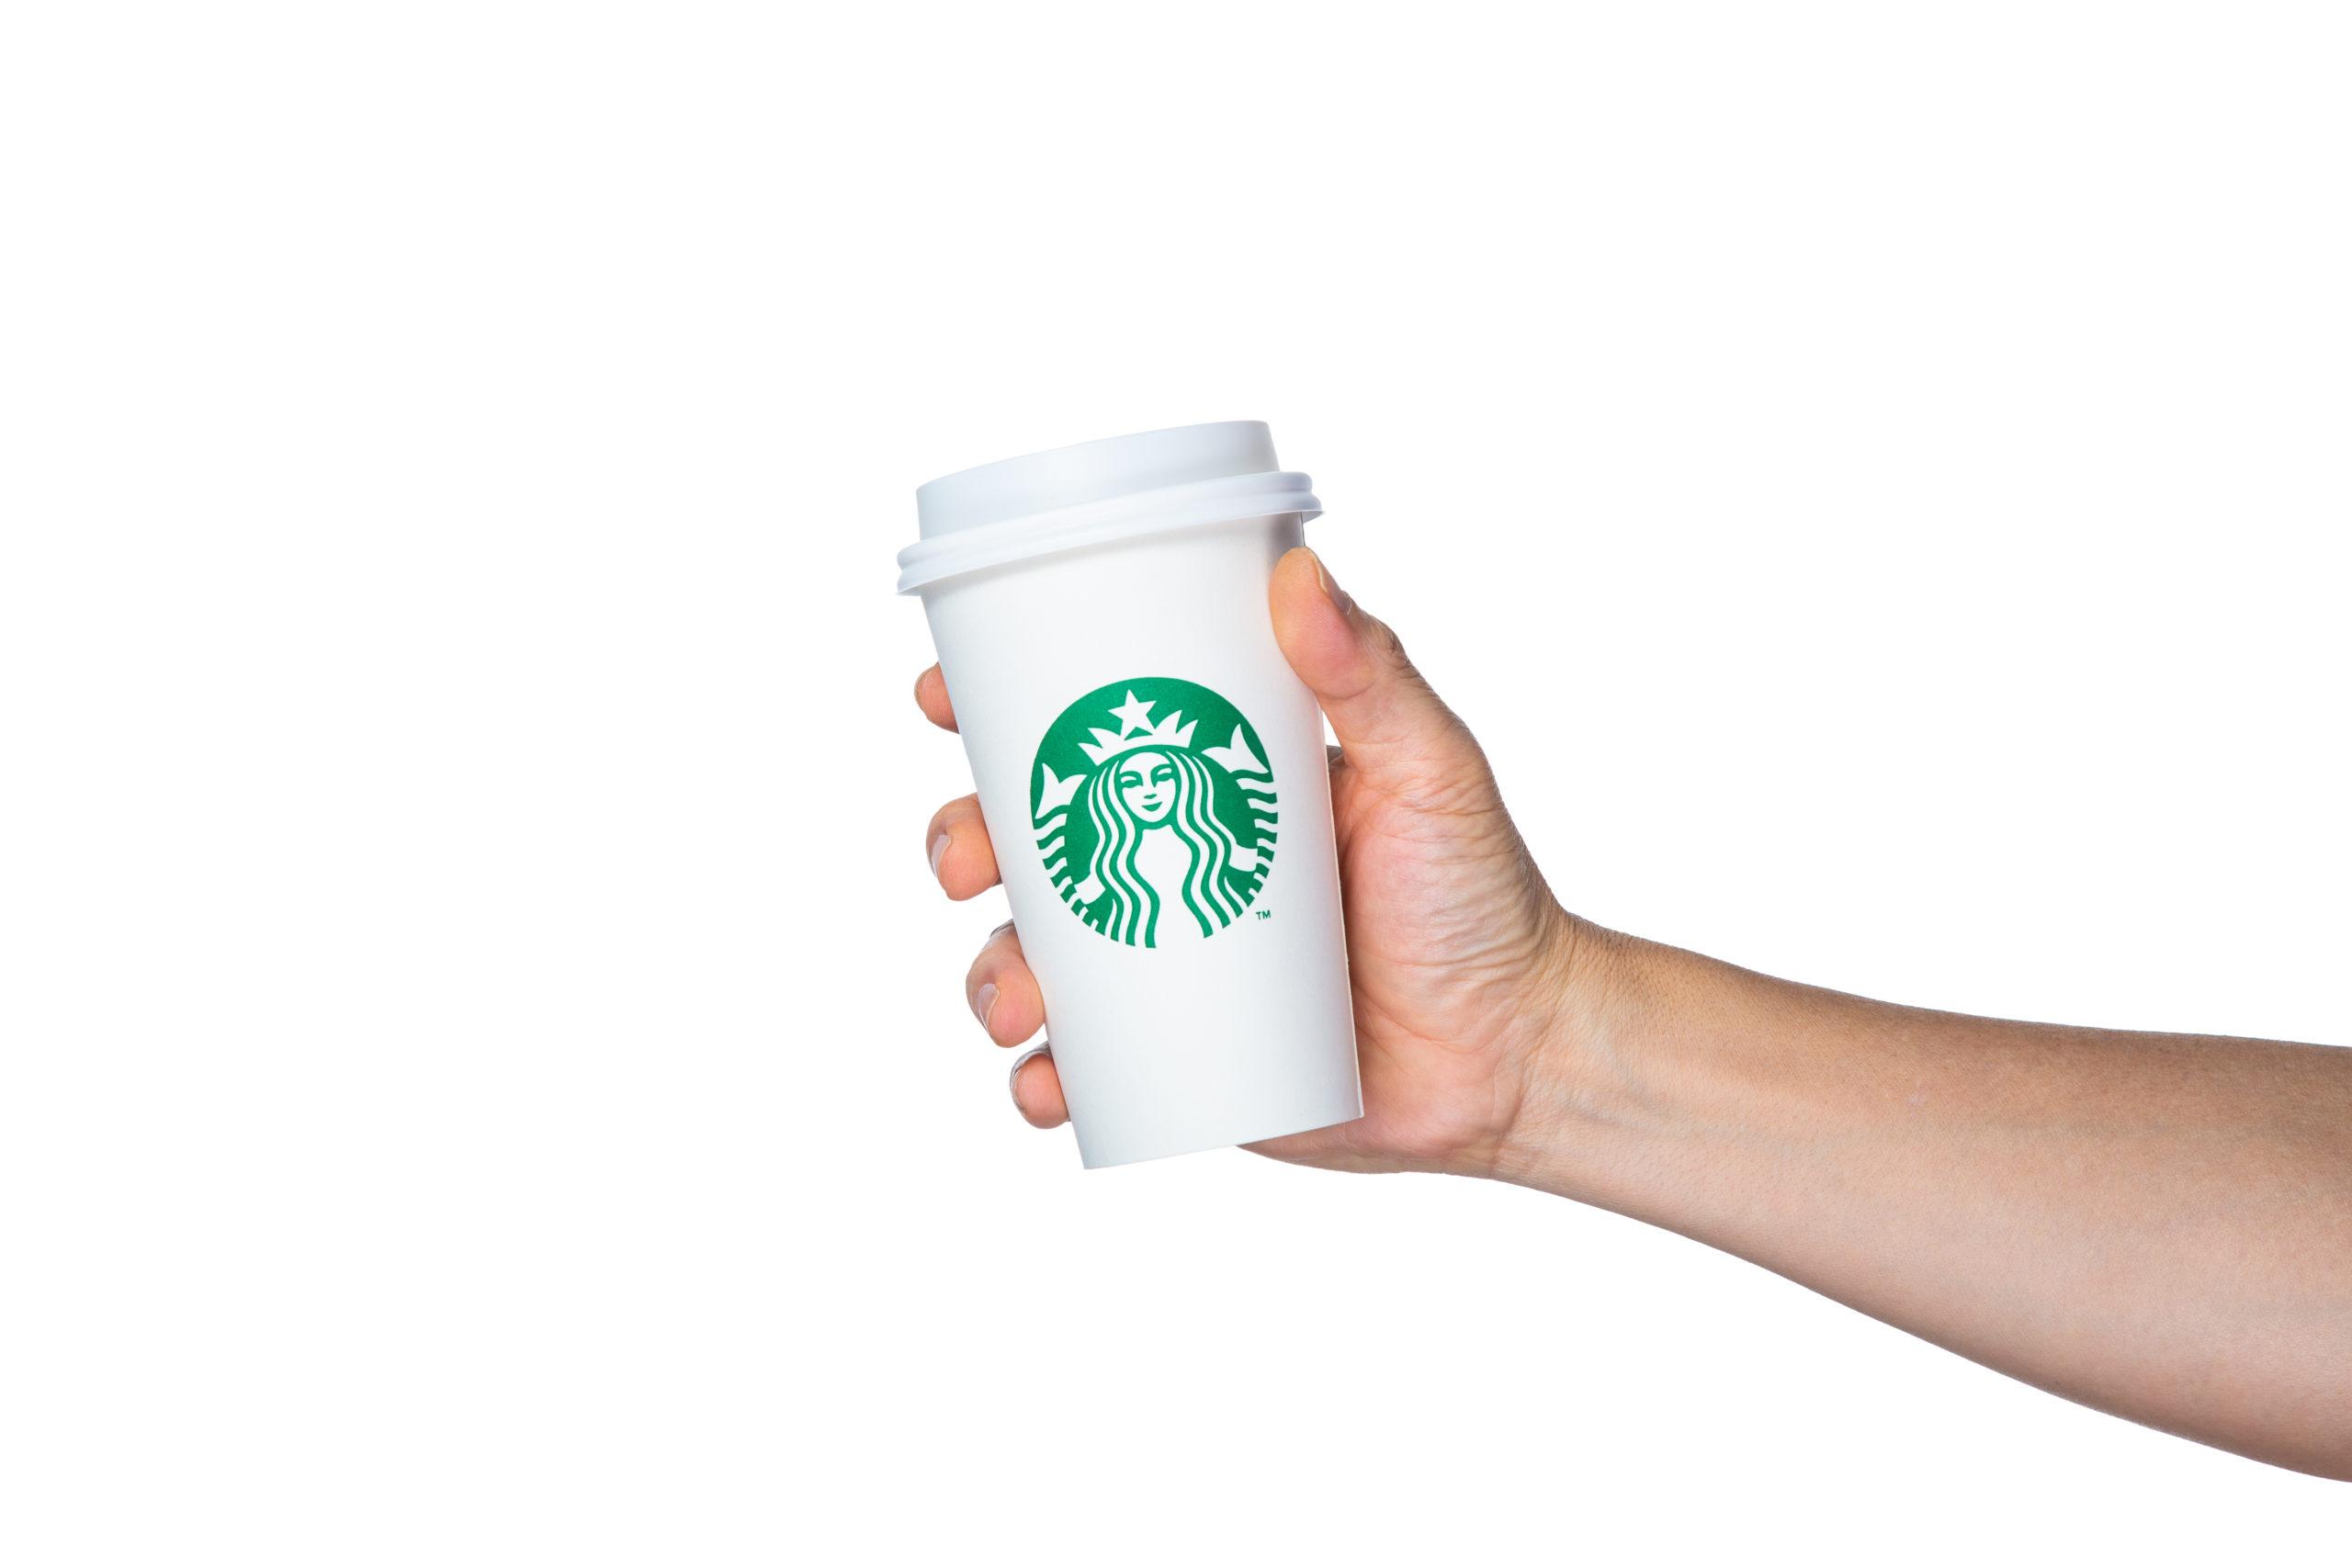 Starbucks podría tener un menú totalmente vegano